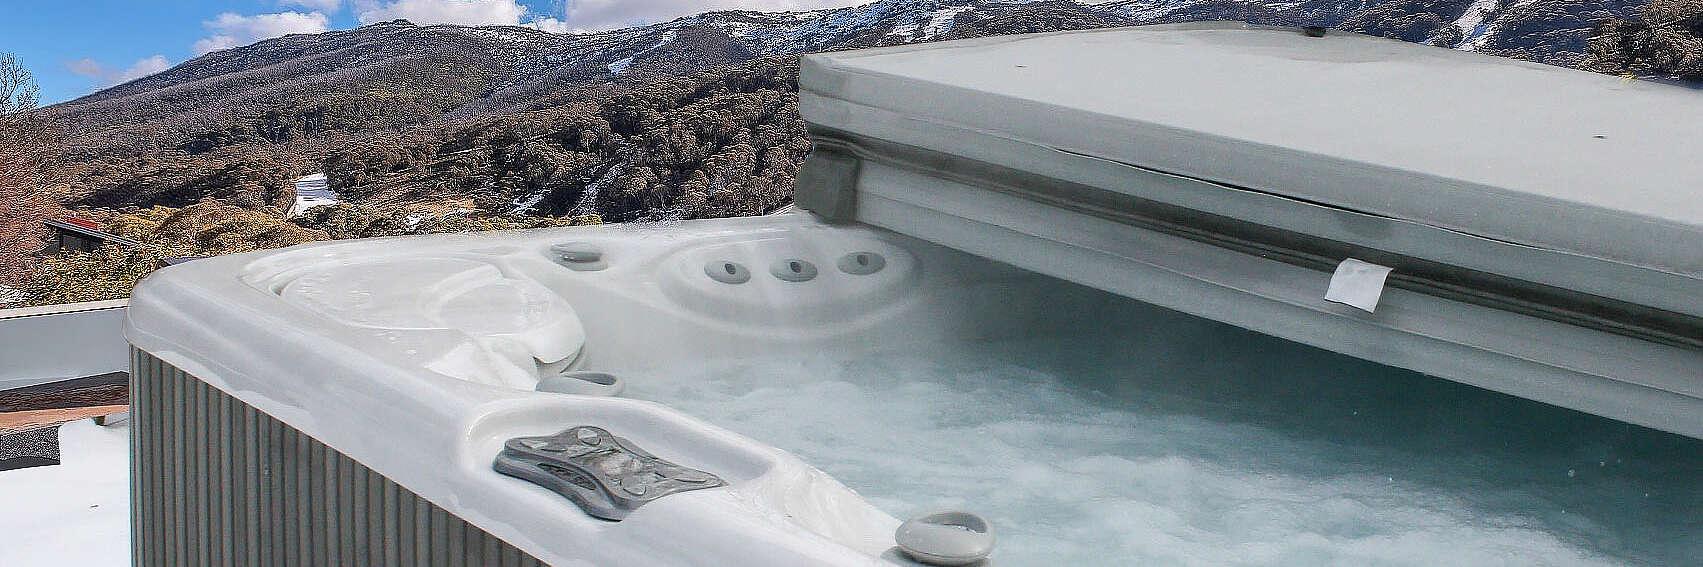 Snowstream 4a